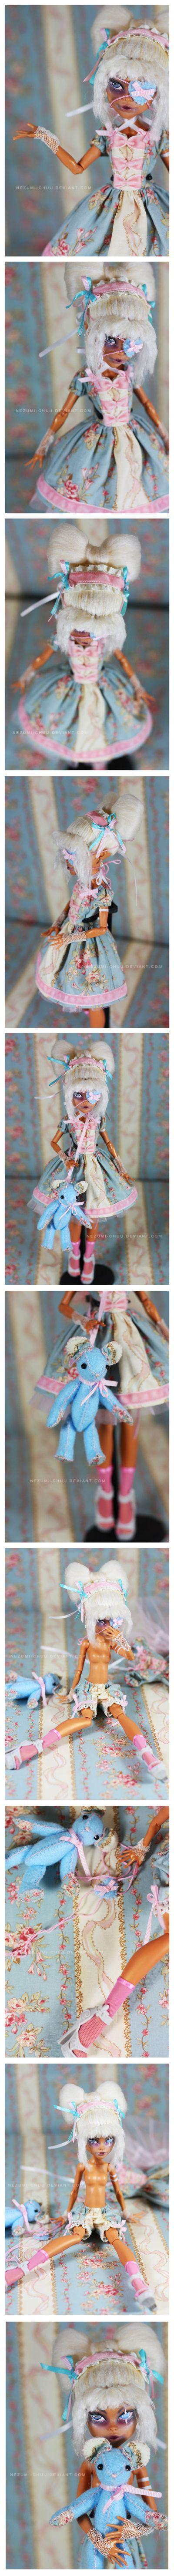 MH : Rorita Nefera Custom by Nezumi-chuu.deviantart.com on @deviantART